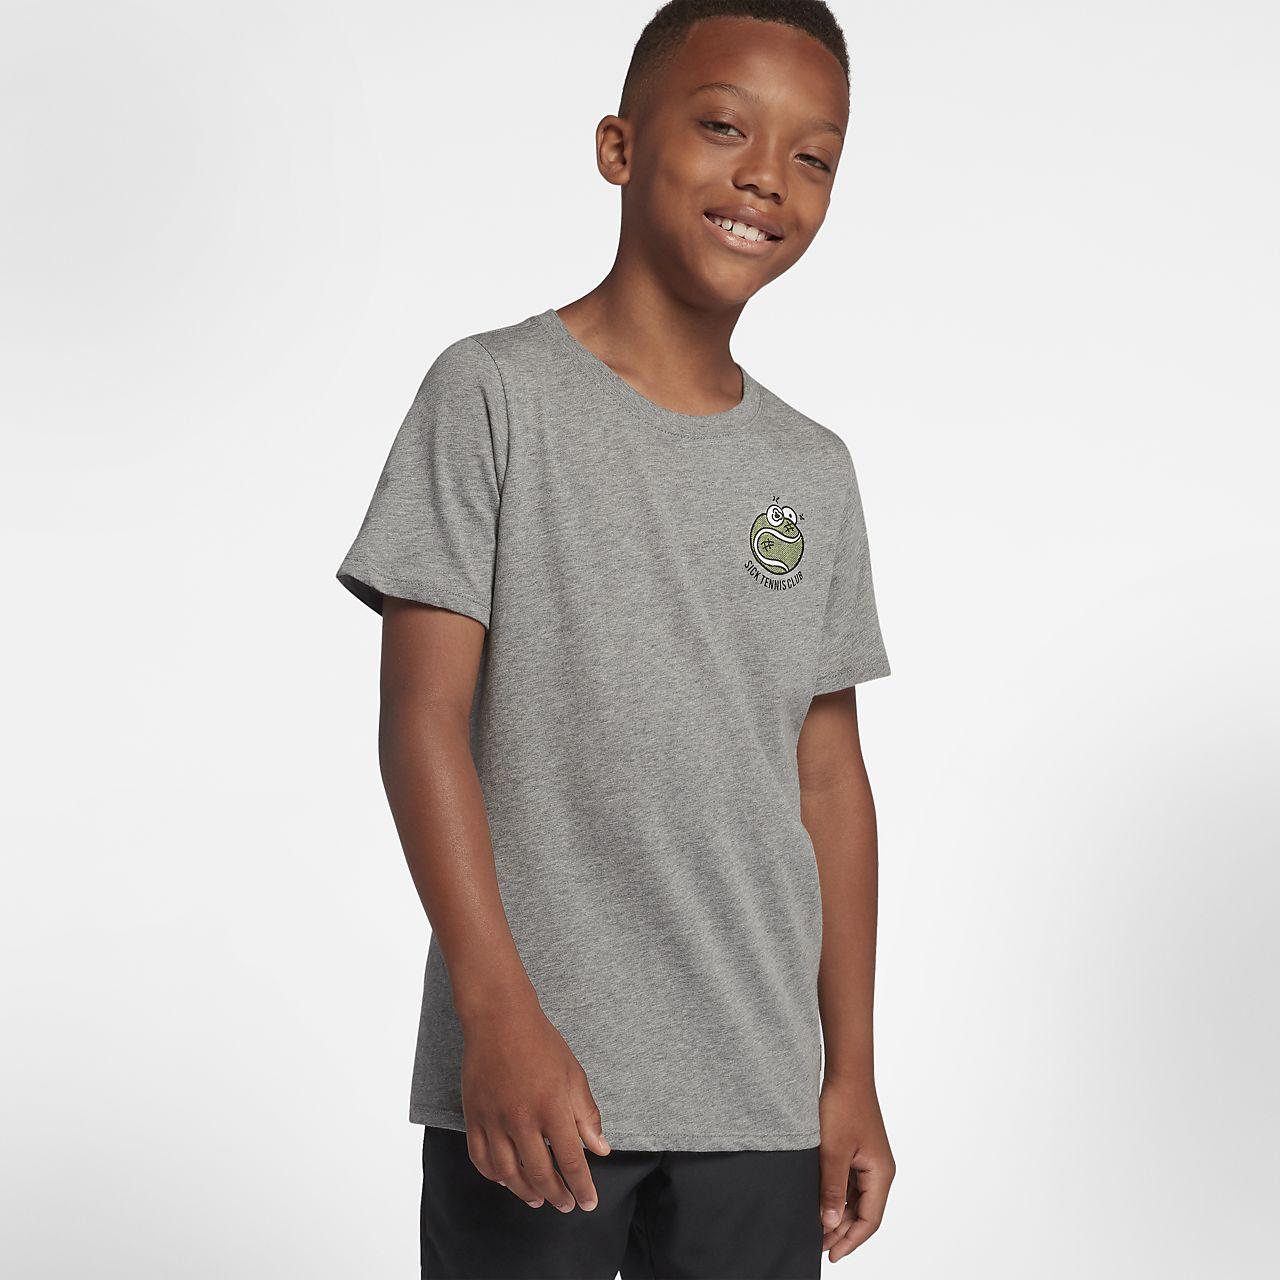 Playera de tenis para niño NikeCourt